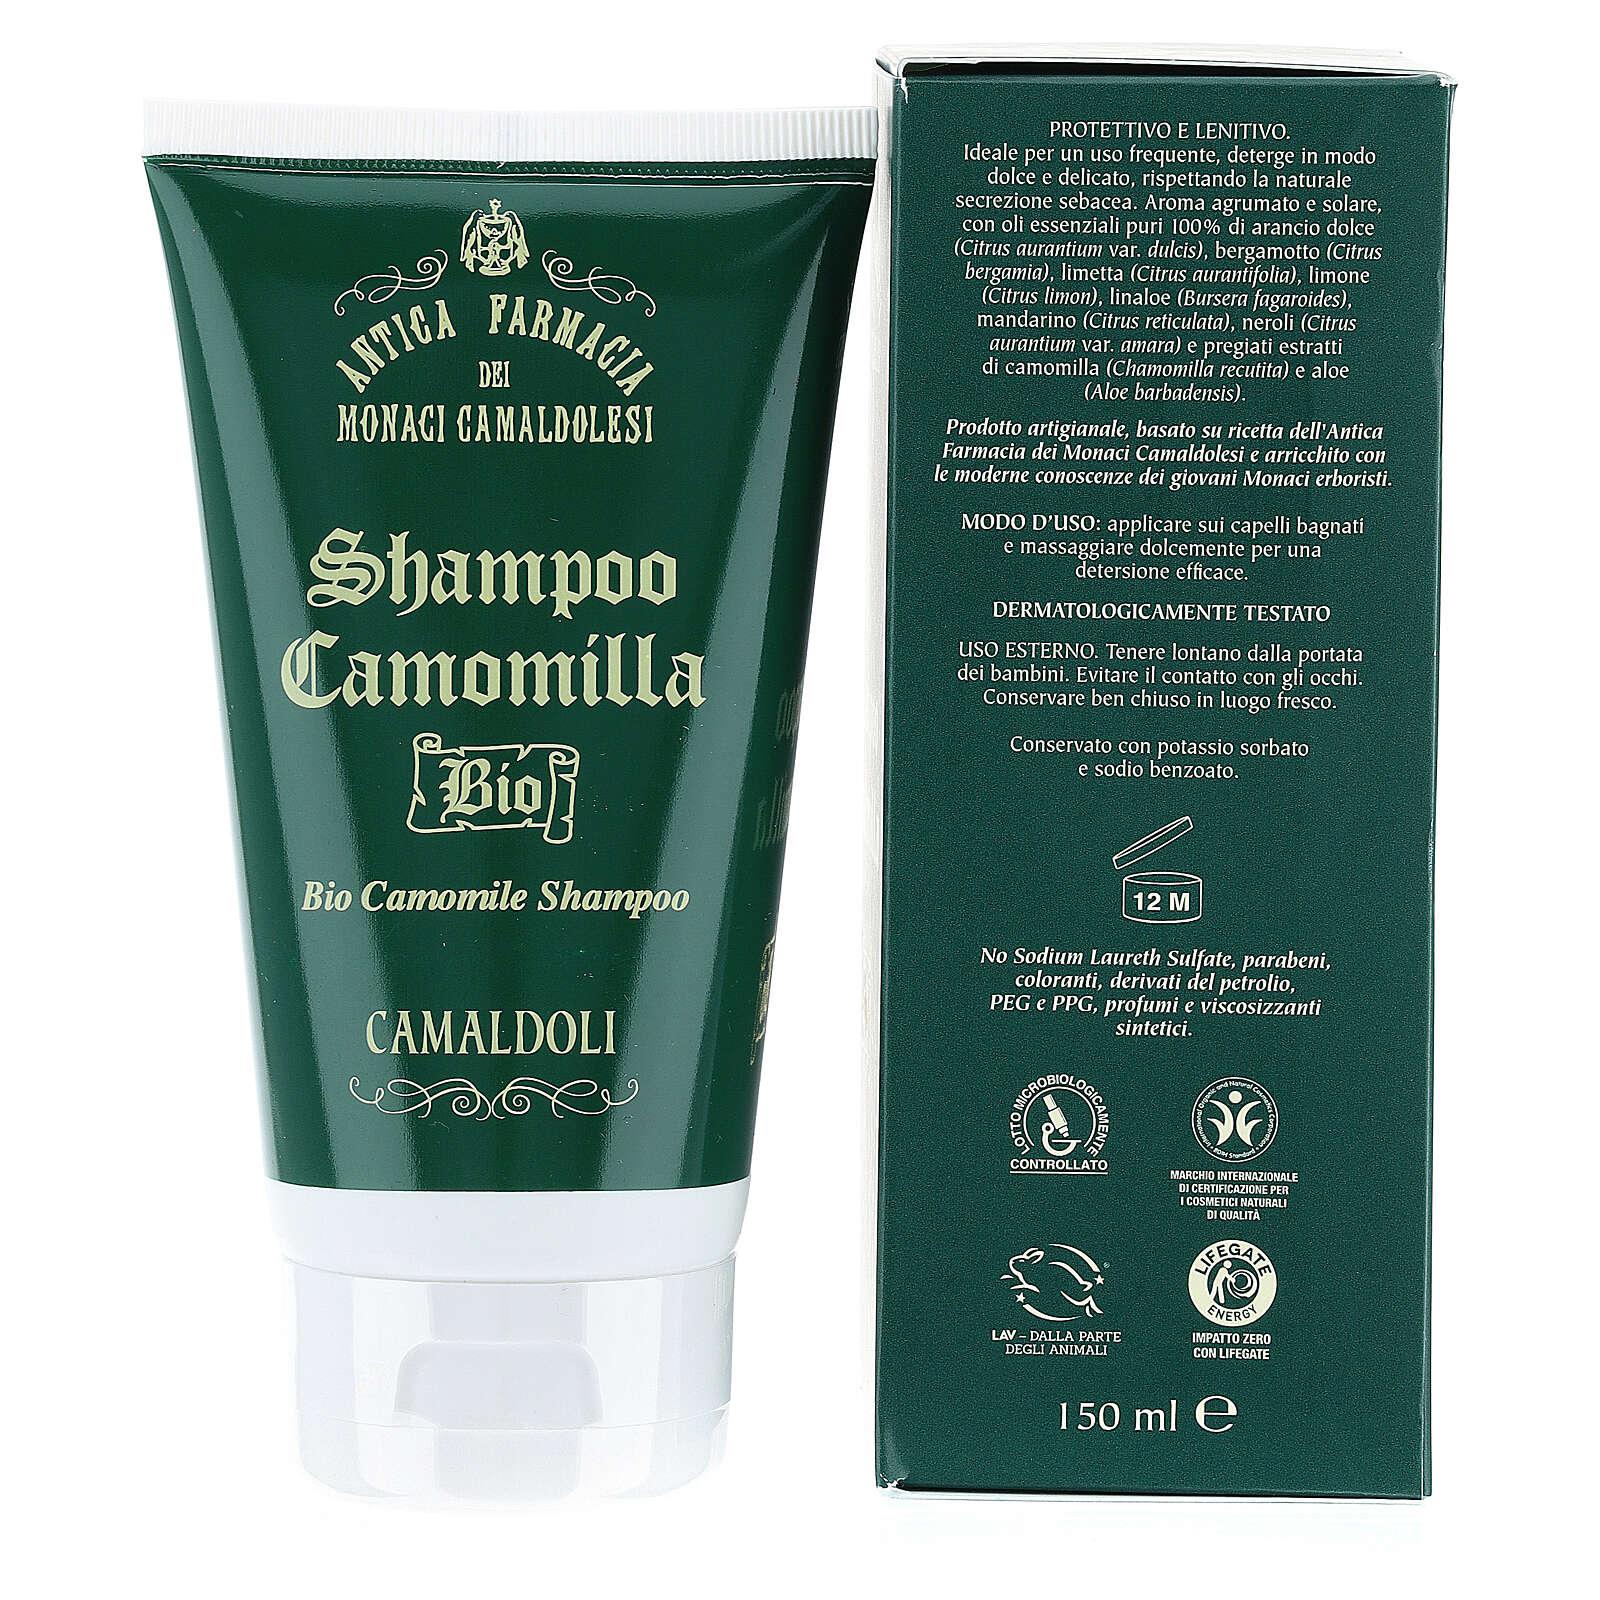 Shampoing Camomille Bio BDIH 150 ml Camaldoli 4